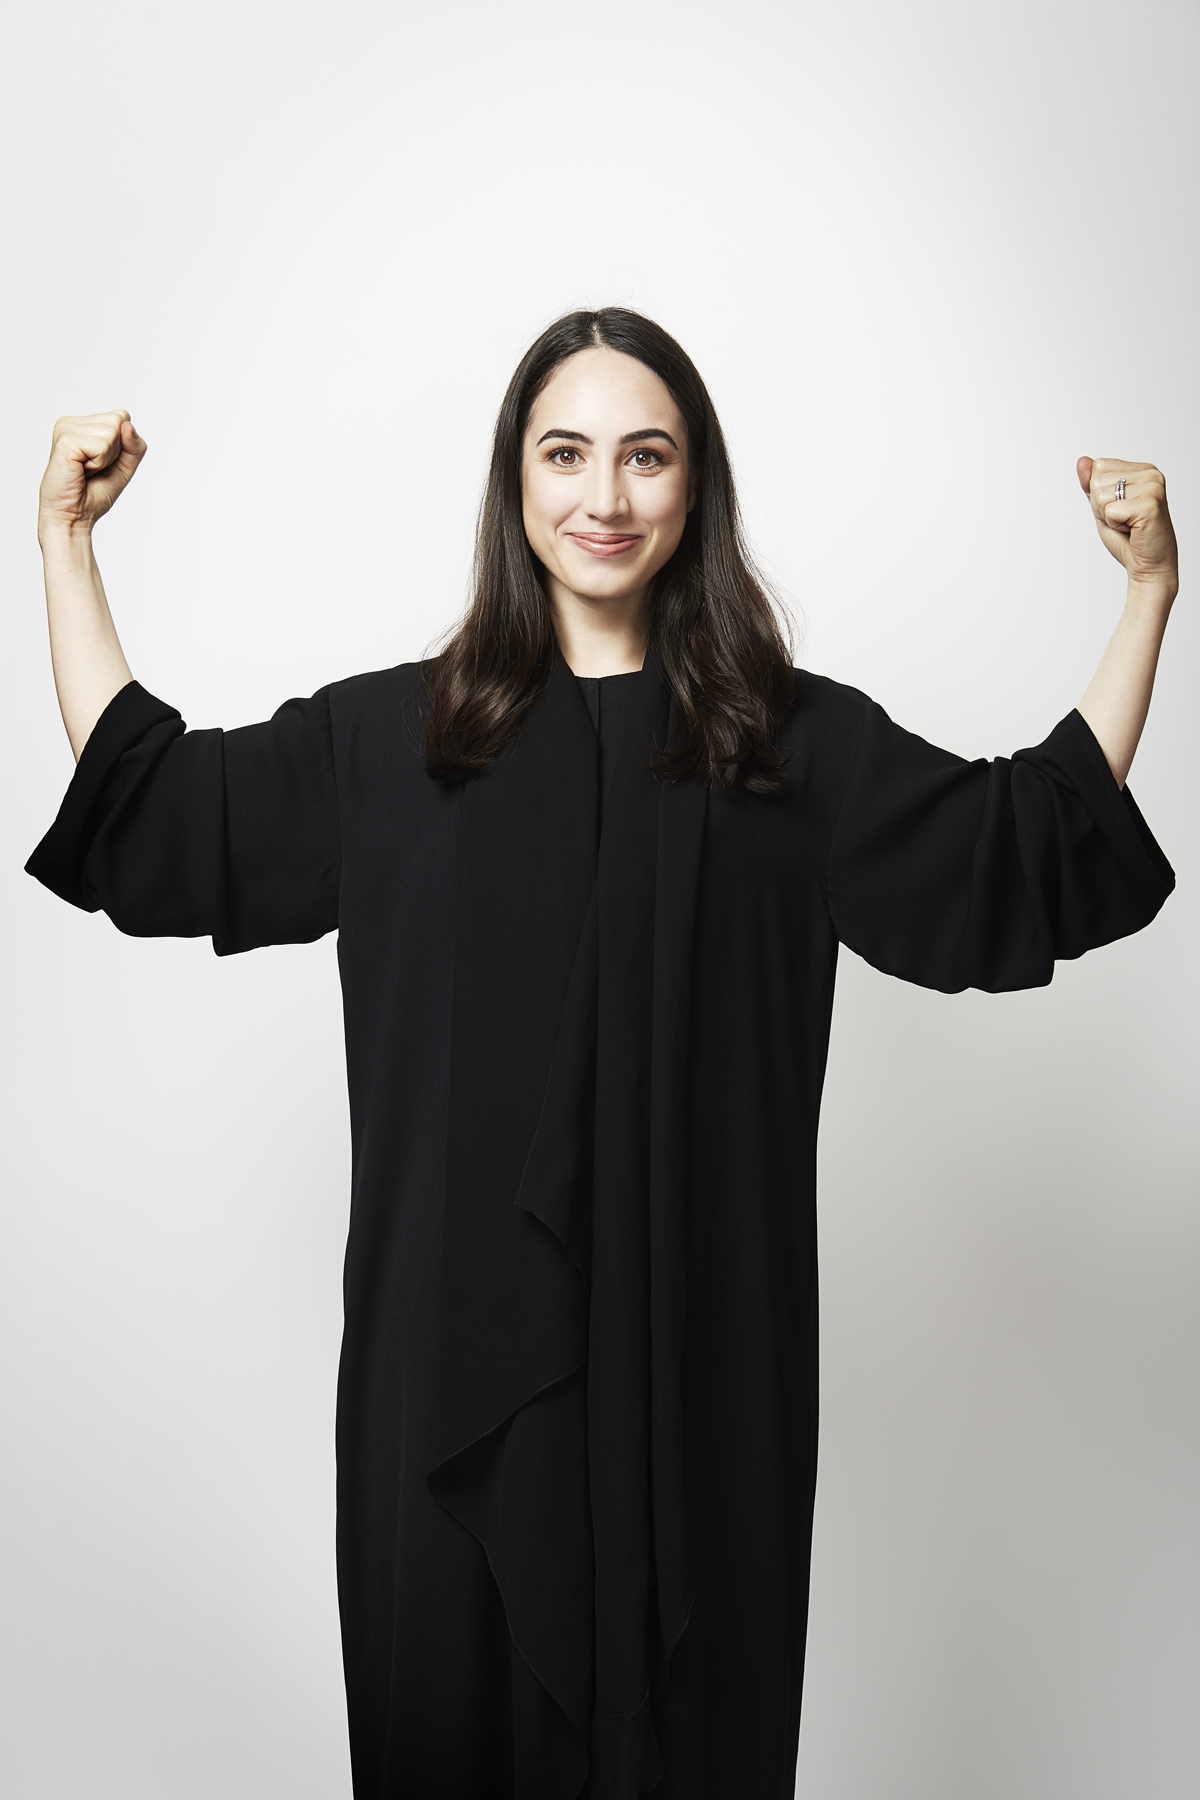 RanaldMackechnie.ADNOC Emirati Women's Day6.jpg